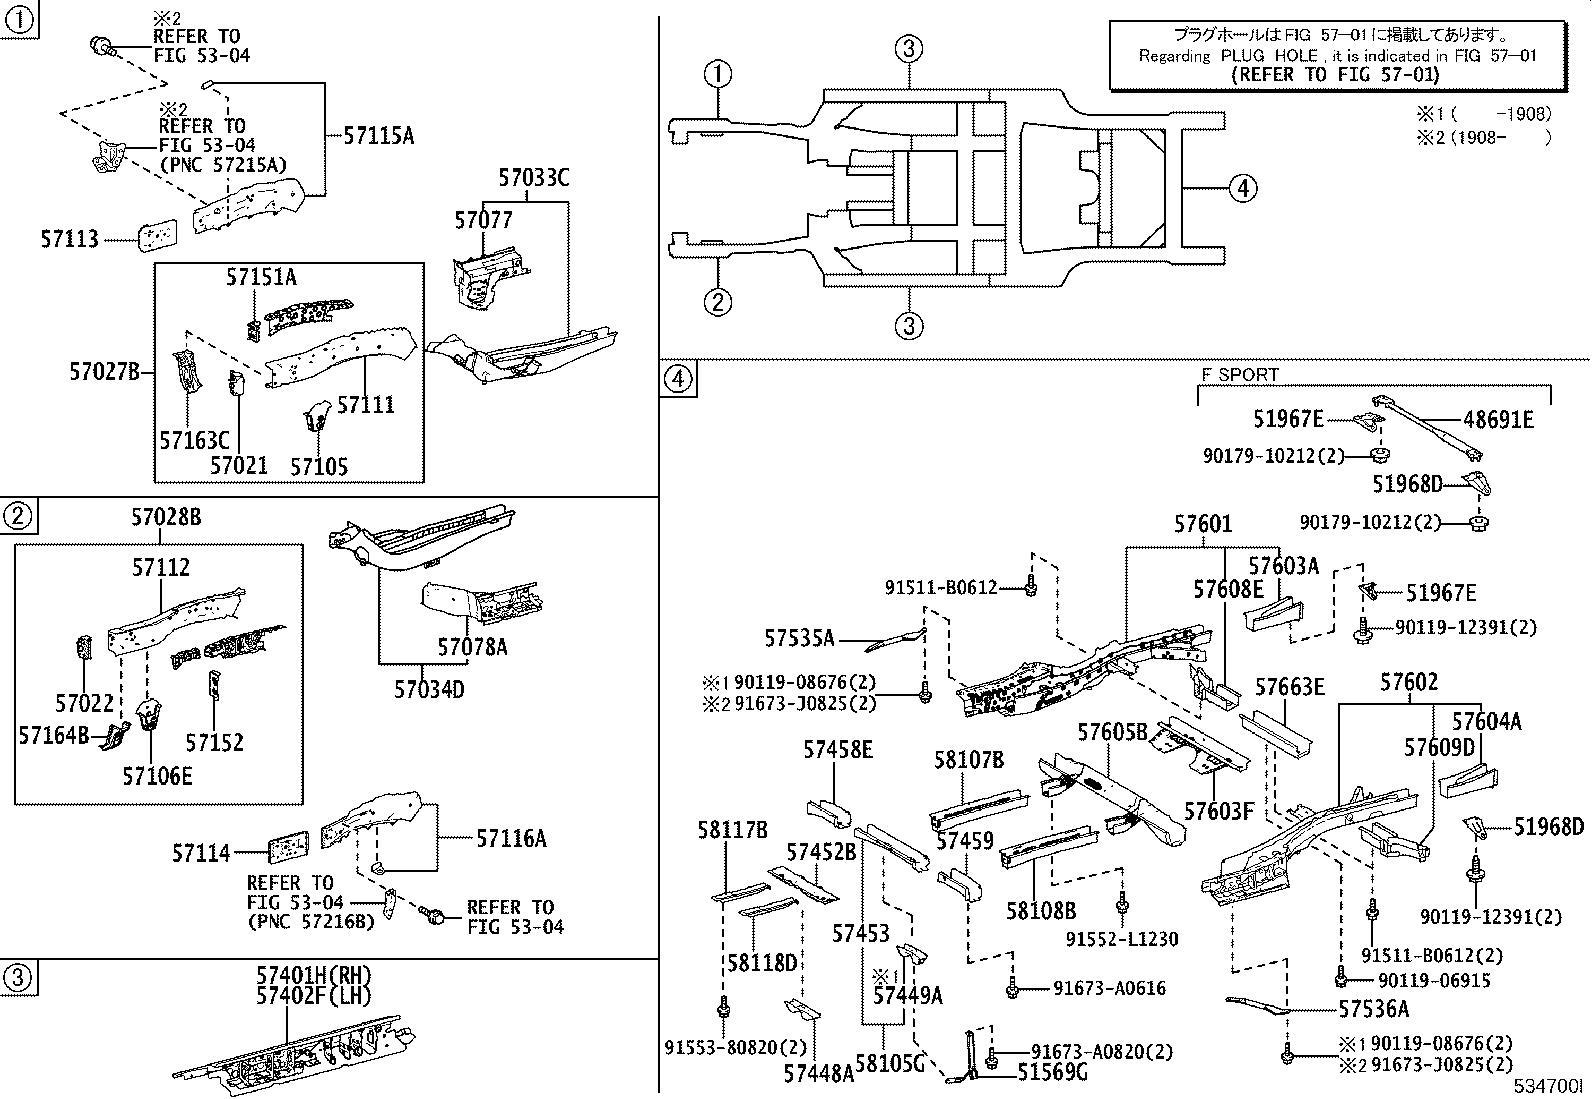 Lexus RX 350 Reinforce sub-assembly, front side member, no